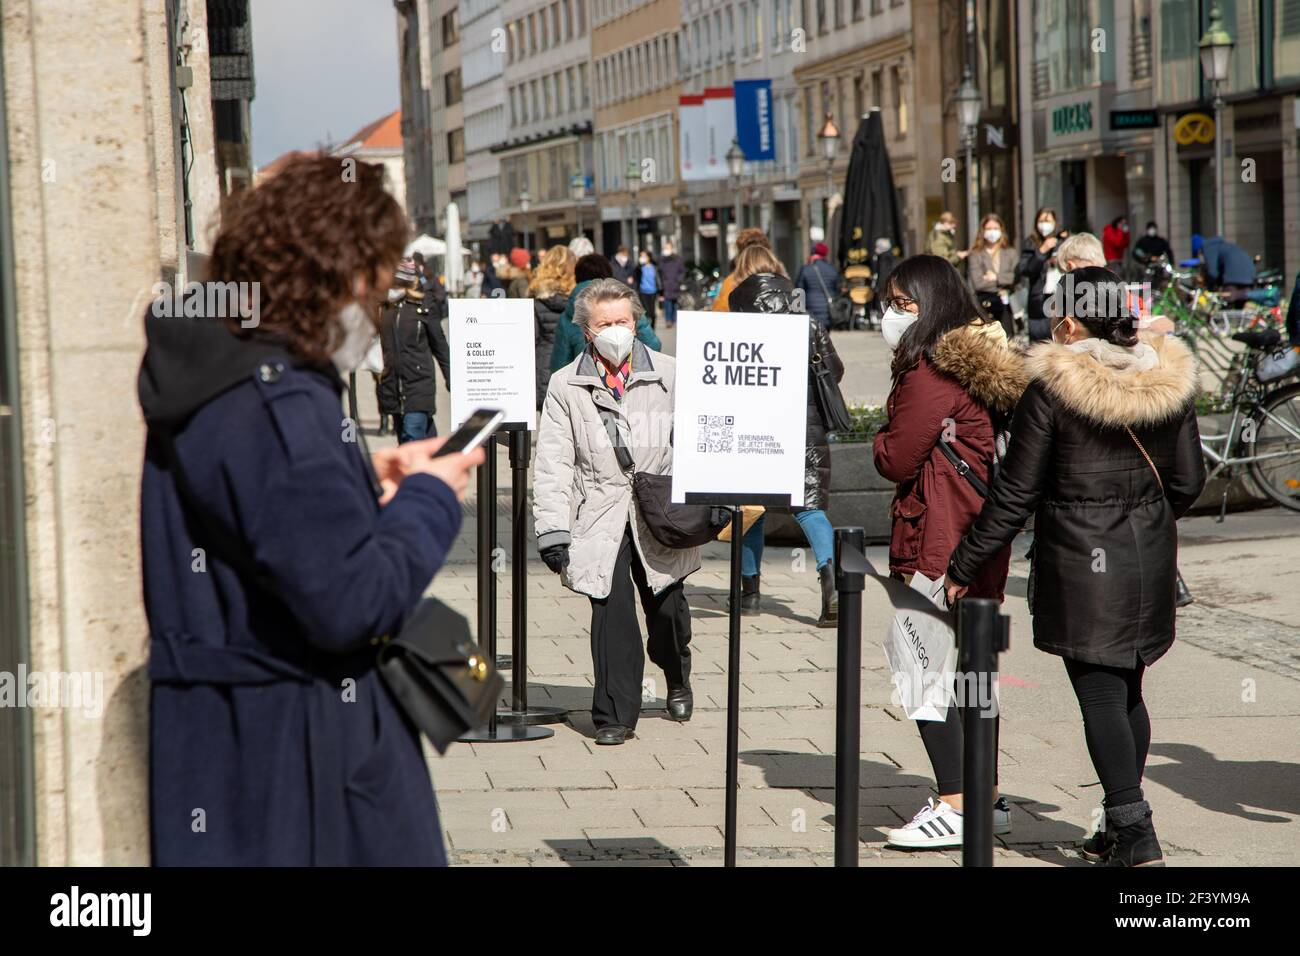 Junge Frau vereinbart Click & Meet Termin, um in ein Geschäft zu kommen. Während die Inzidenz in München weiter ansteigt und evtl. Bald die Geschäfte wieder schließen müssen, sind viele Menschen am 18. März 2021 in der Münchner Innenstadt unterwegs und kaufen ein. Die neuen varianten des Coronavirus betragen in der Landeshauptstadt aktuell fast 70%. * mientras que la incidencia está aumentando y las tiendas pueden tener que cerrar de nuevo, mucha gente el 18 2021 de marzo va a la zona peatonal en Munich, Alemania y compra cosas. El número de nuevas variantes en Munich es de alrededor del 70%. (Foto de Alexander Pohl/Sipa USA Foto de stock